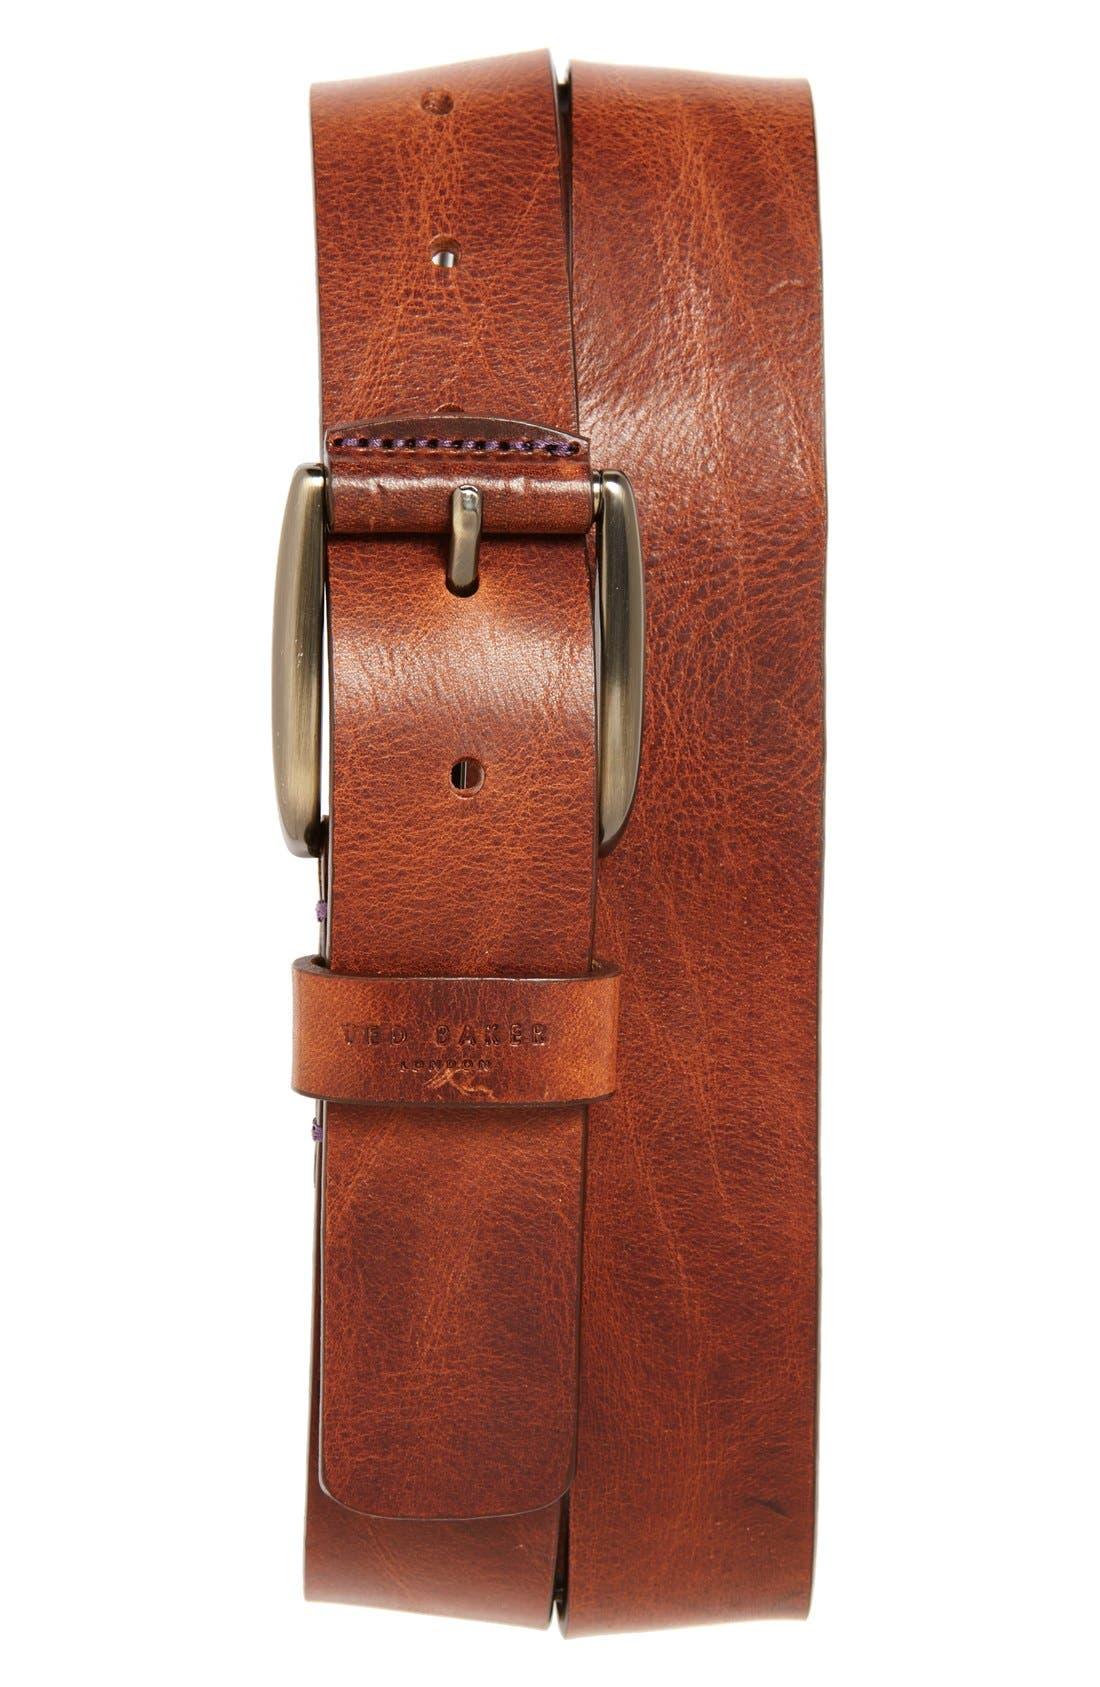 TED BAKER LONDON, 'Jean' Leather Belt, Main thumbnail 1, color, TAN